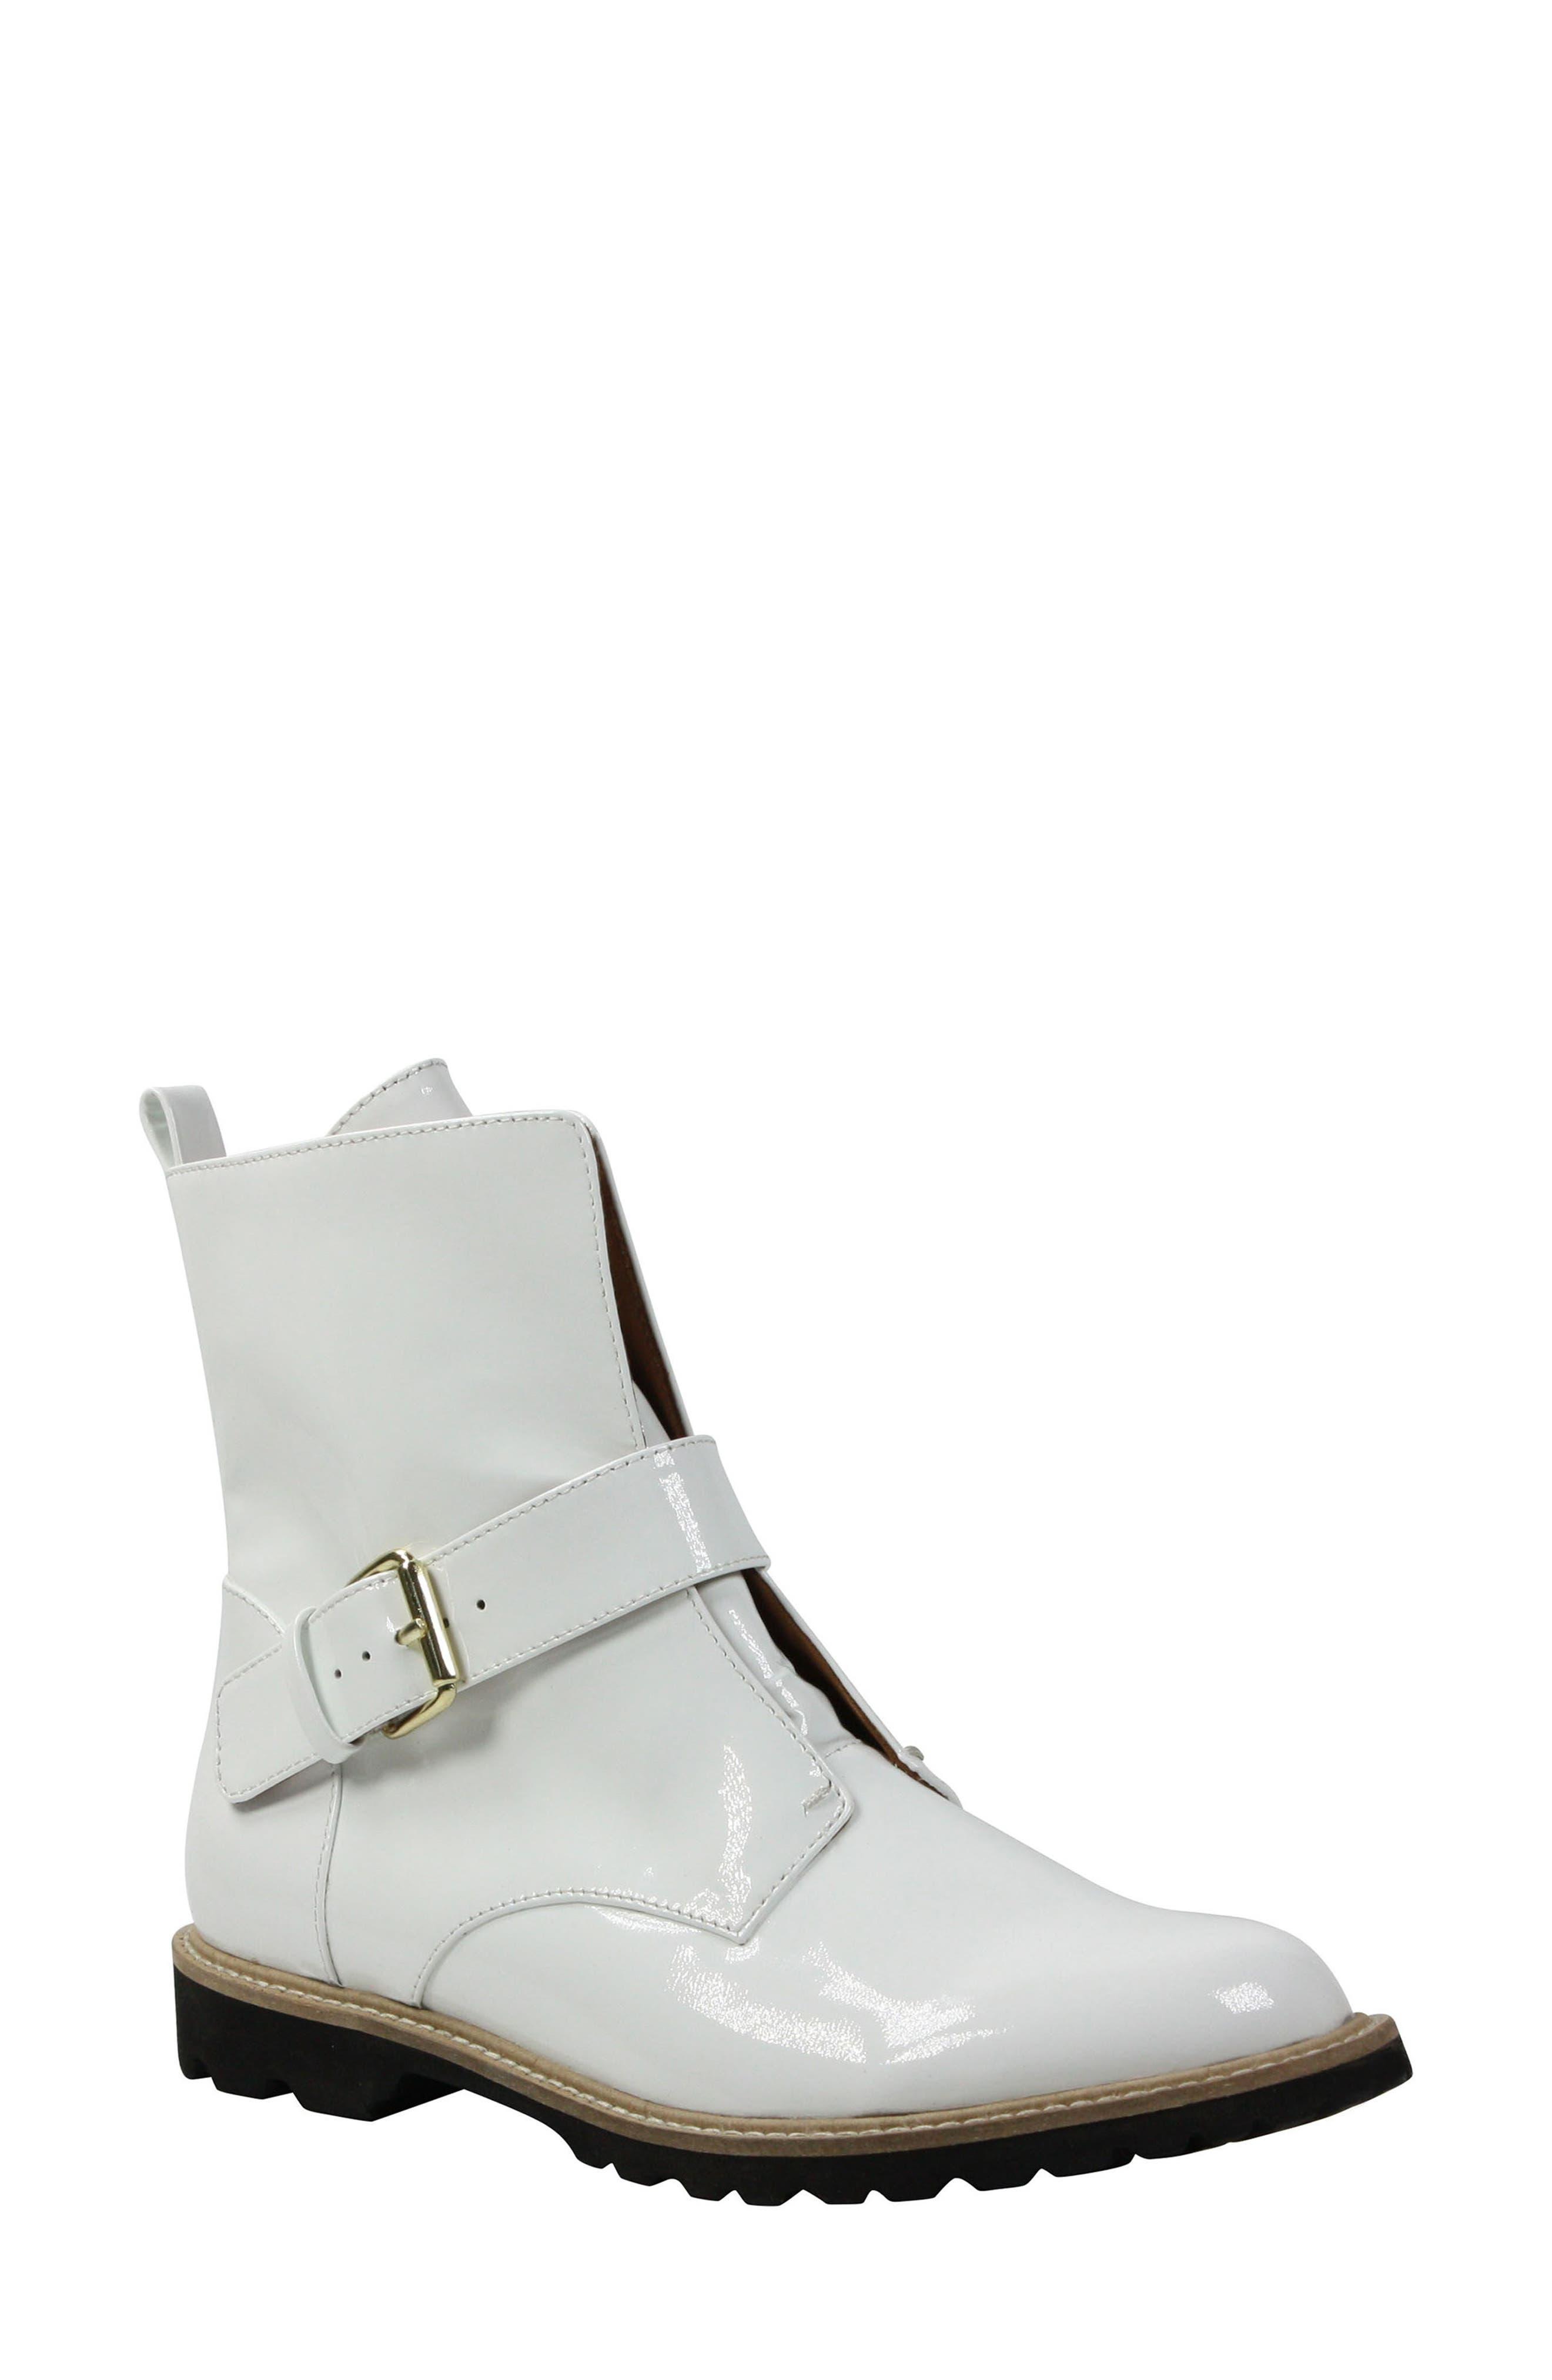 Alternate Image 1 Selected - L'Amour des Pieds Rapolano Boot (Women)